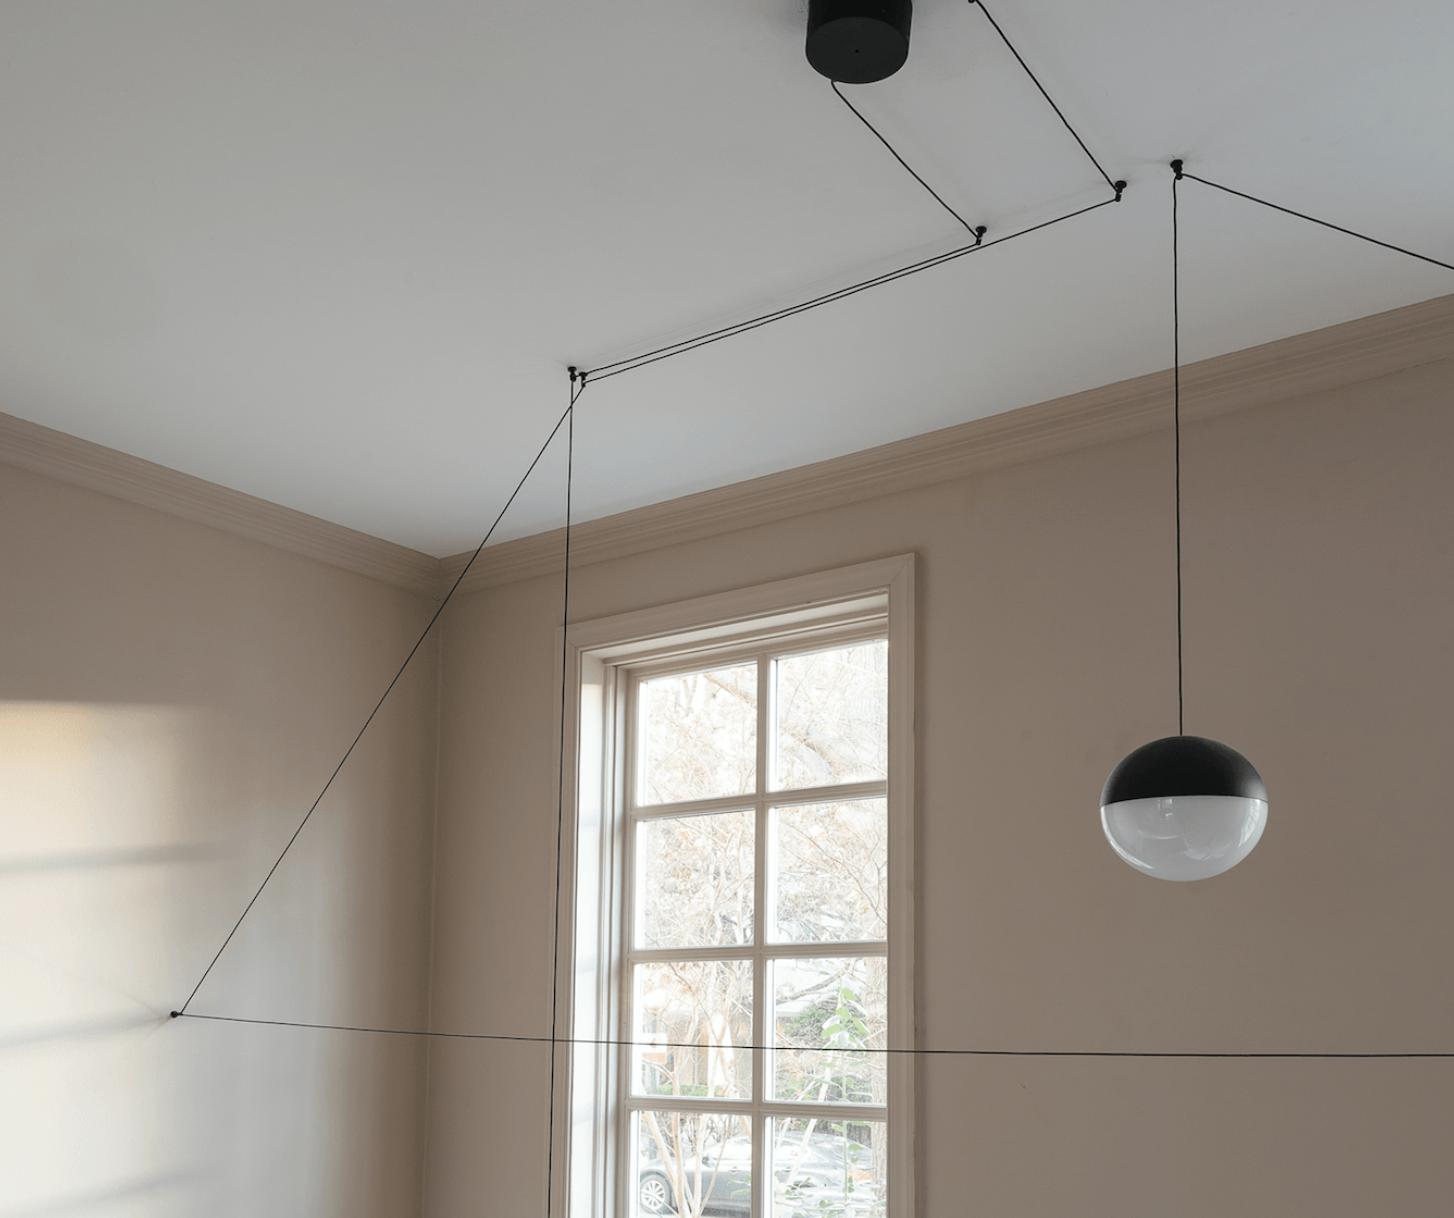 Home Outdoor Underground Electrical Wire Besides Focus Bbq Light Lighting